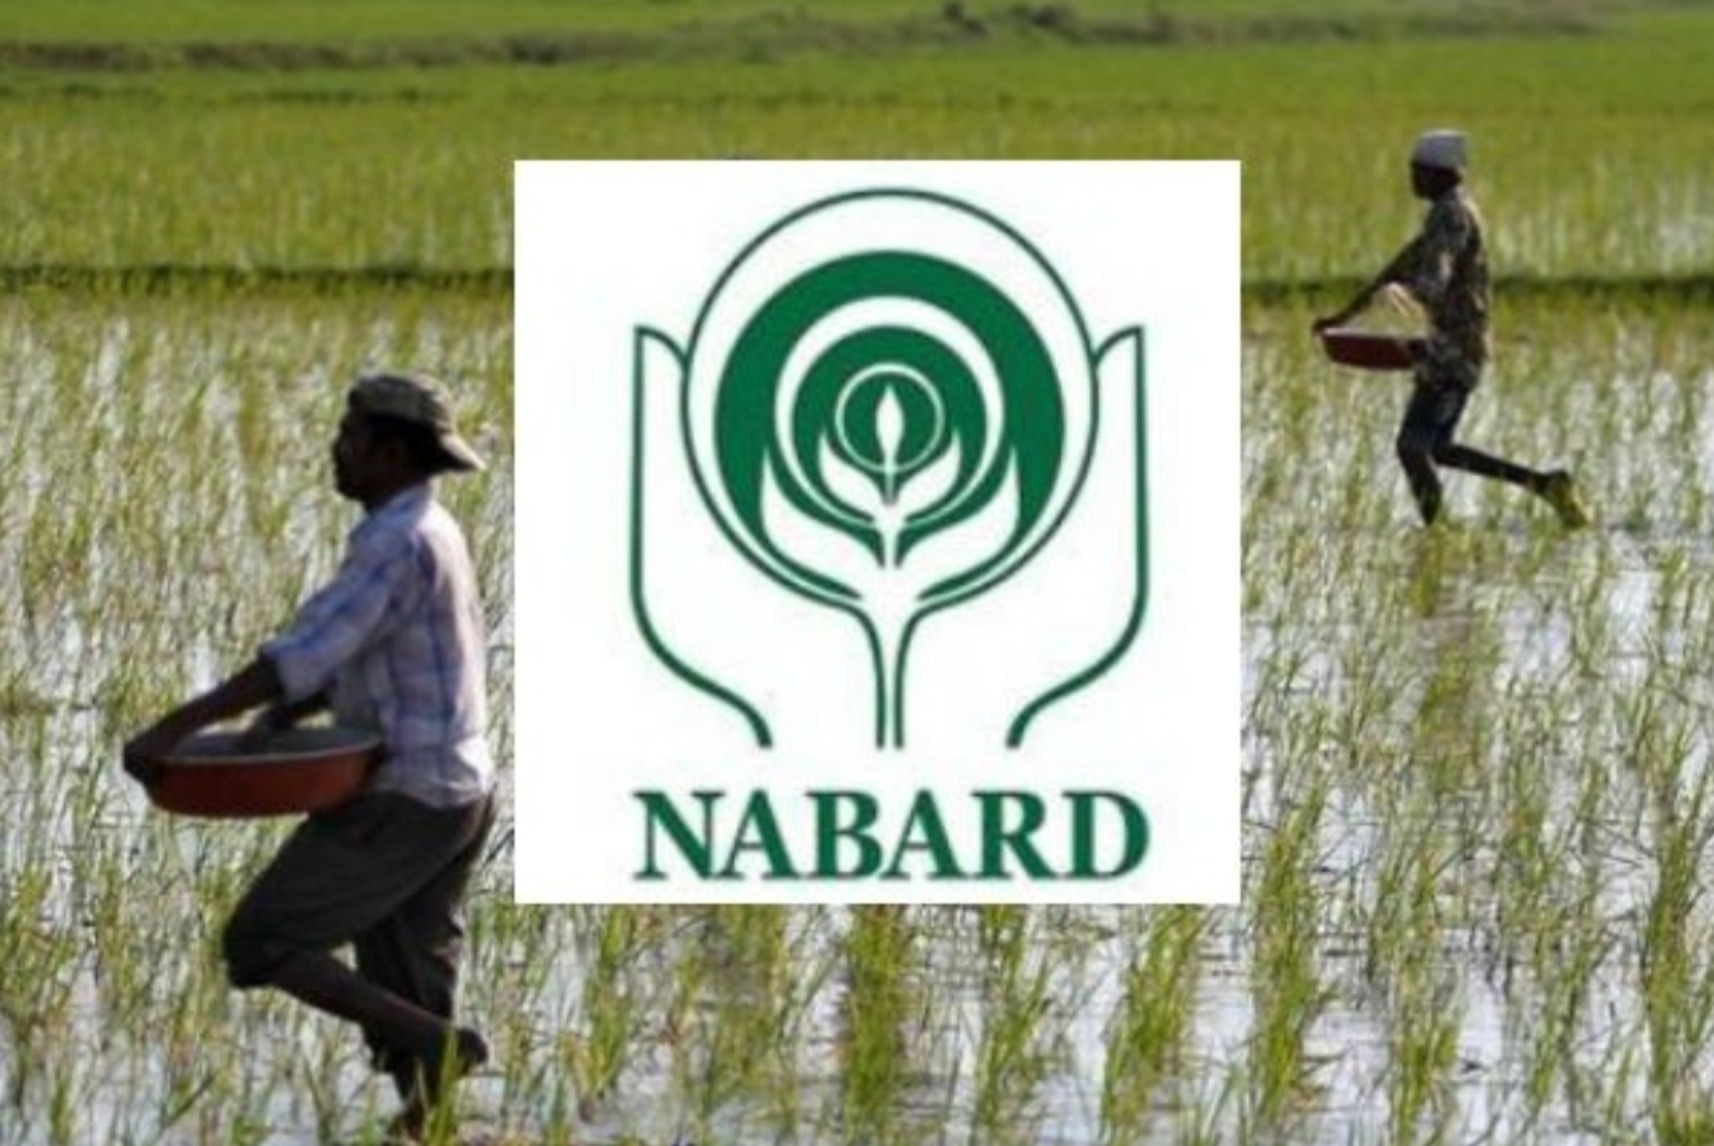 NABARD sanctions Rs 735 cr under RIDF Bengal - Sentinelassam